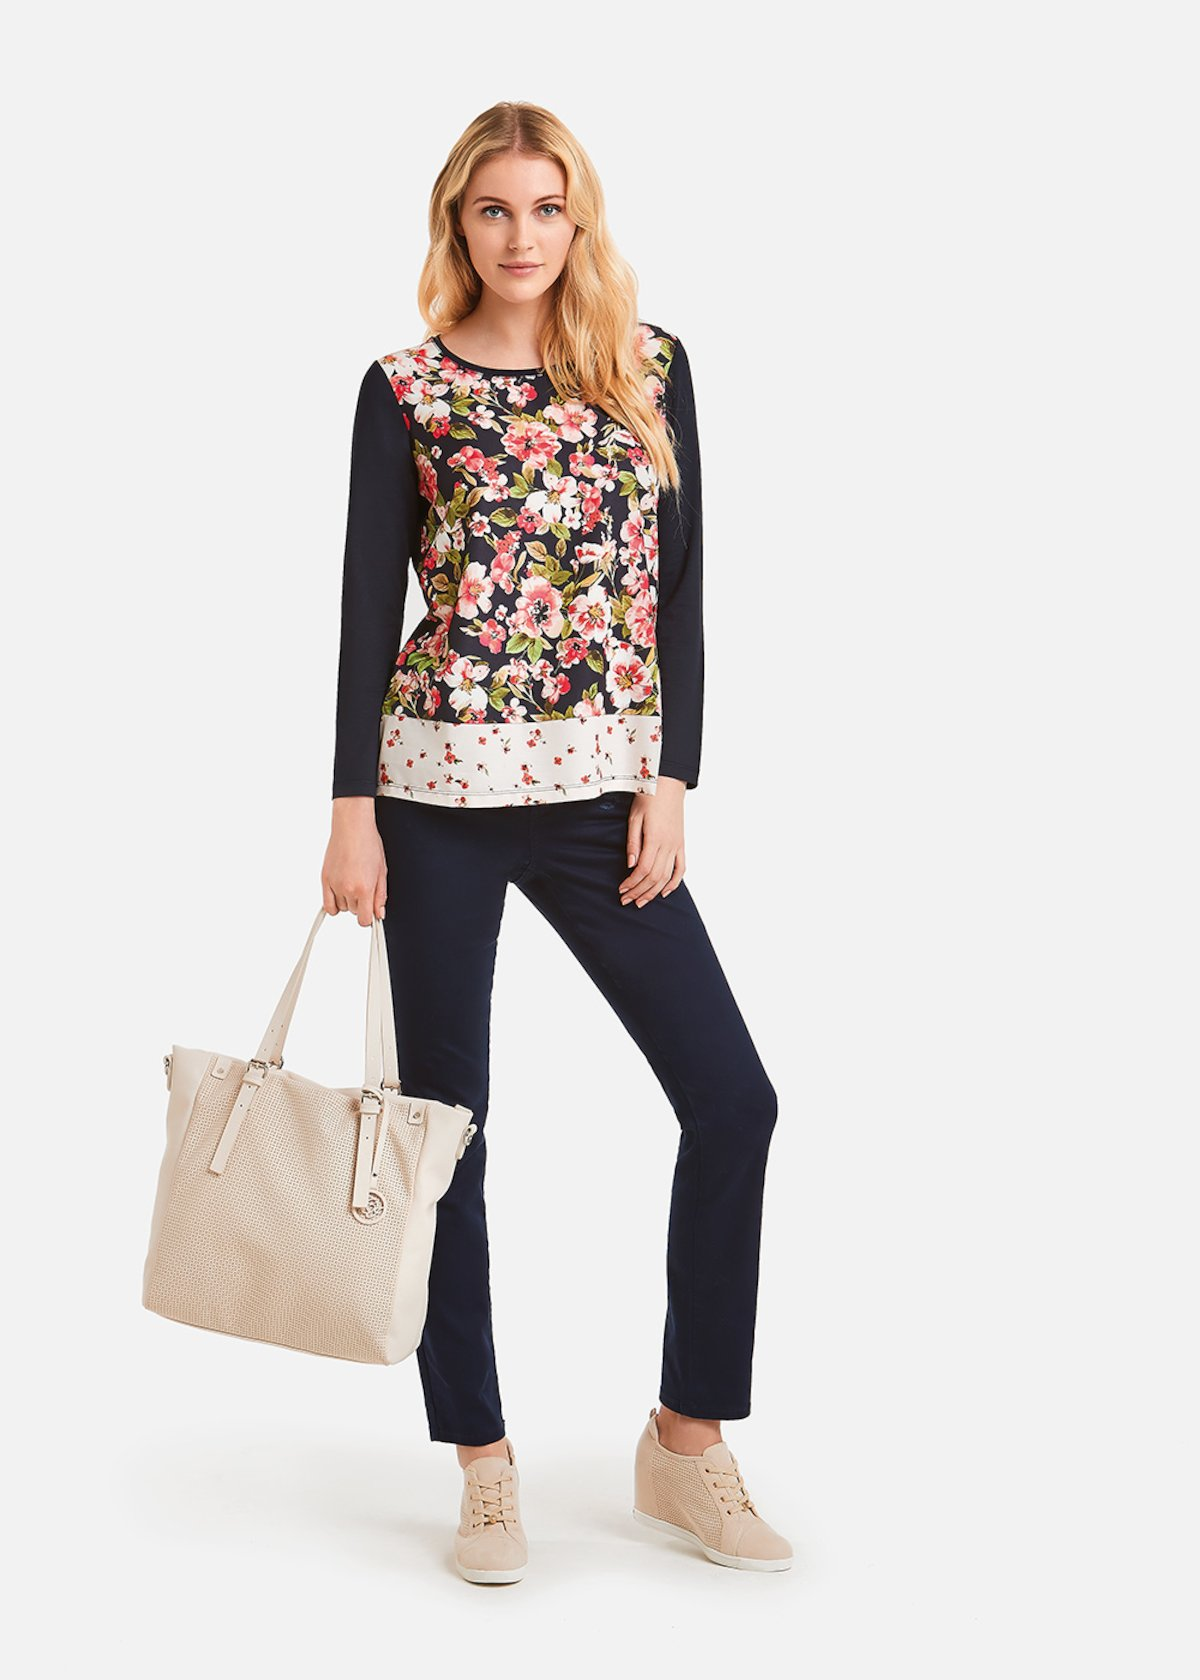 Samy t-shirt floral pattern